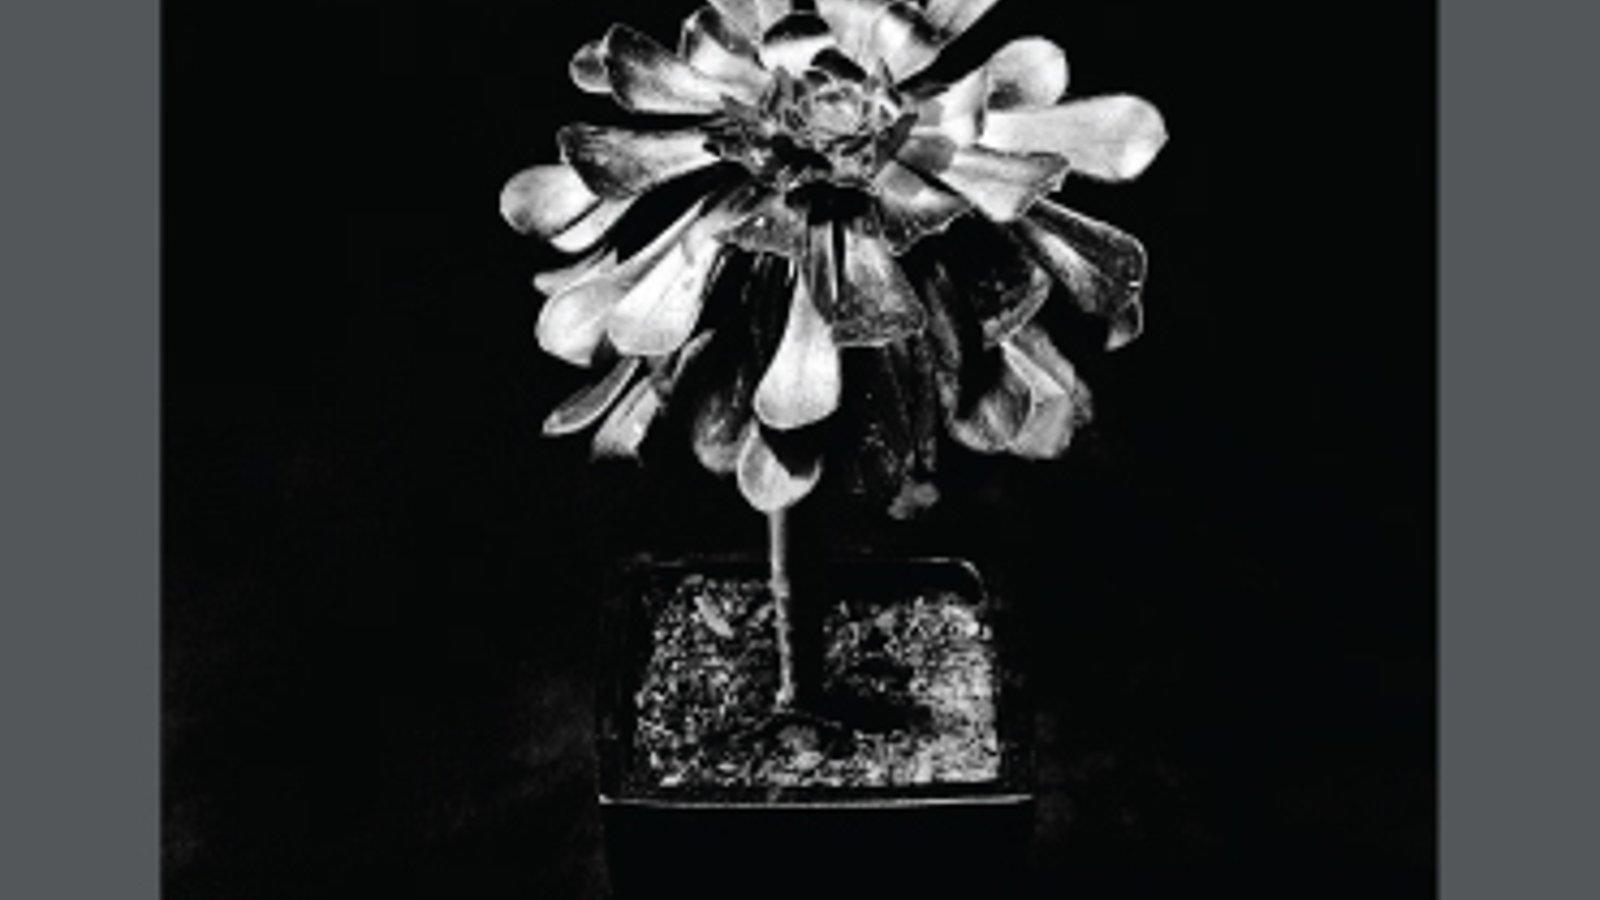 Trent Parke: The Black Rose